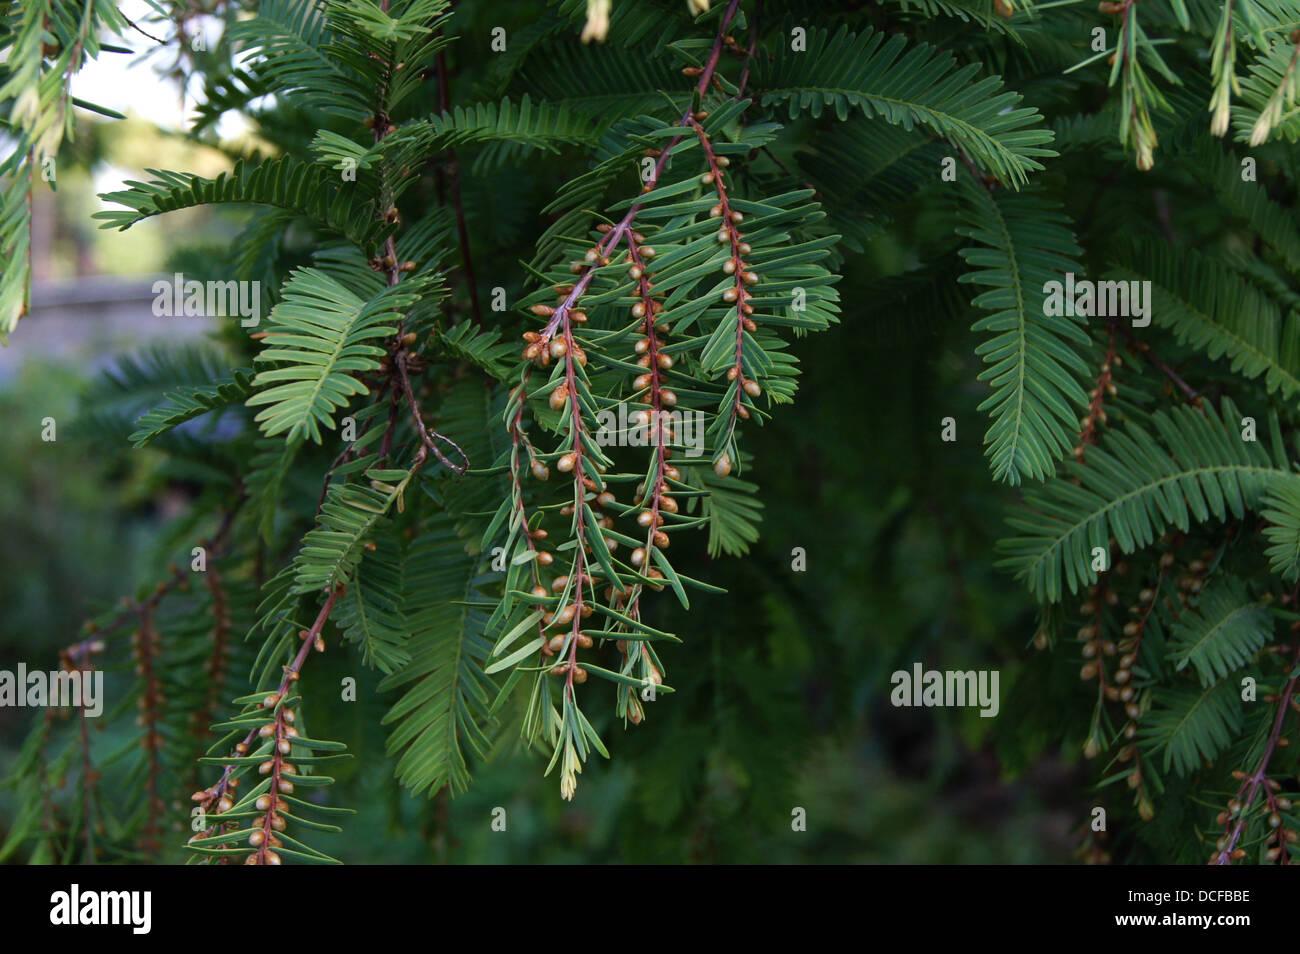 Metasequoia glyptostroboides Hu & Cheng. Historical tree of the Jardin des Plantes de Paris, planted in 1948. - Stock Image